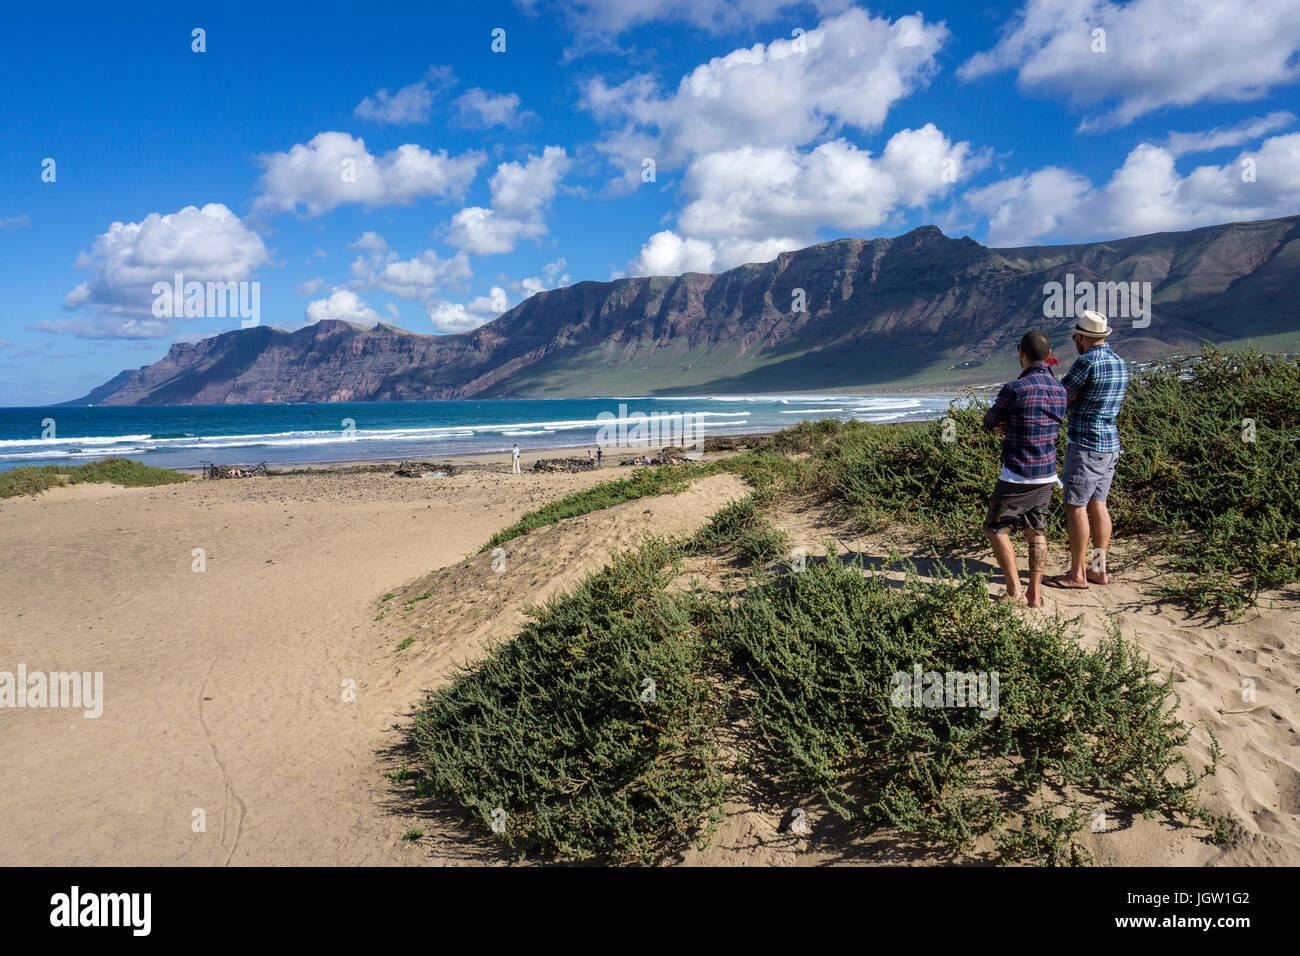 Sand dunes at Playa de San Juan, behind the Famara-cliff, La Caleta de Famara, Lanzarote island, Canary islands, - Stock Image